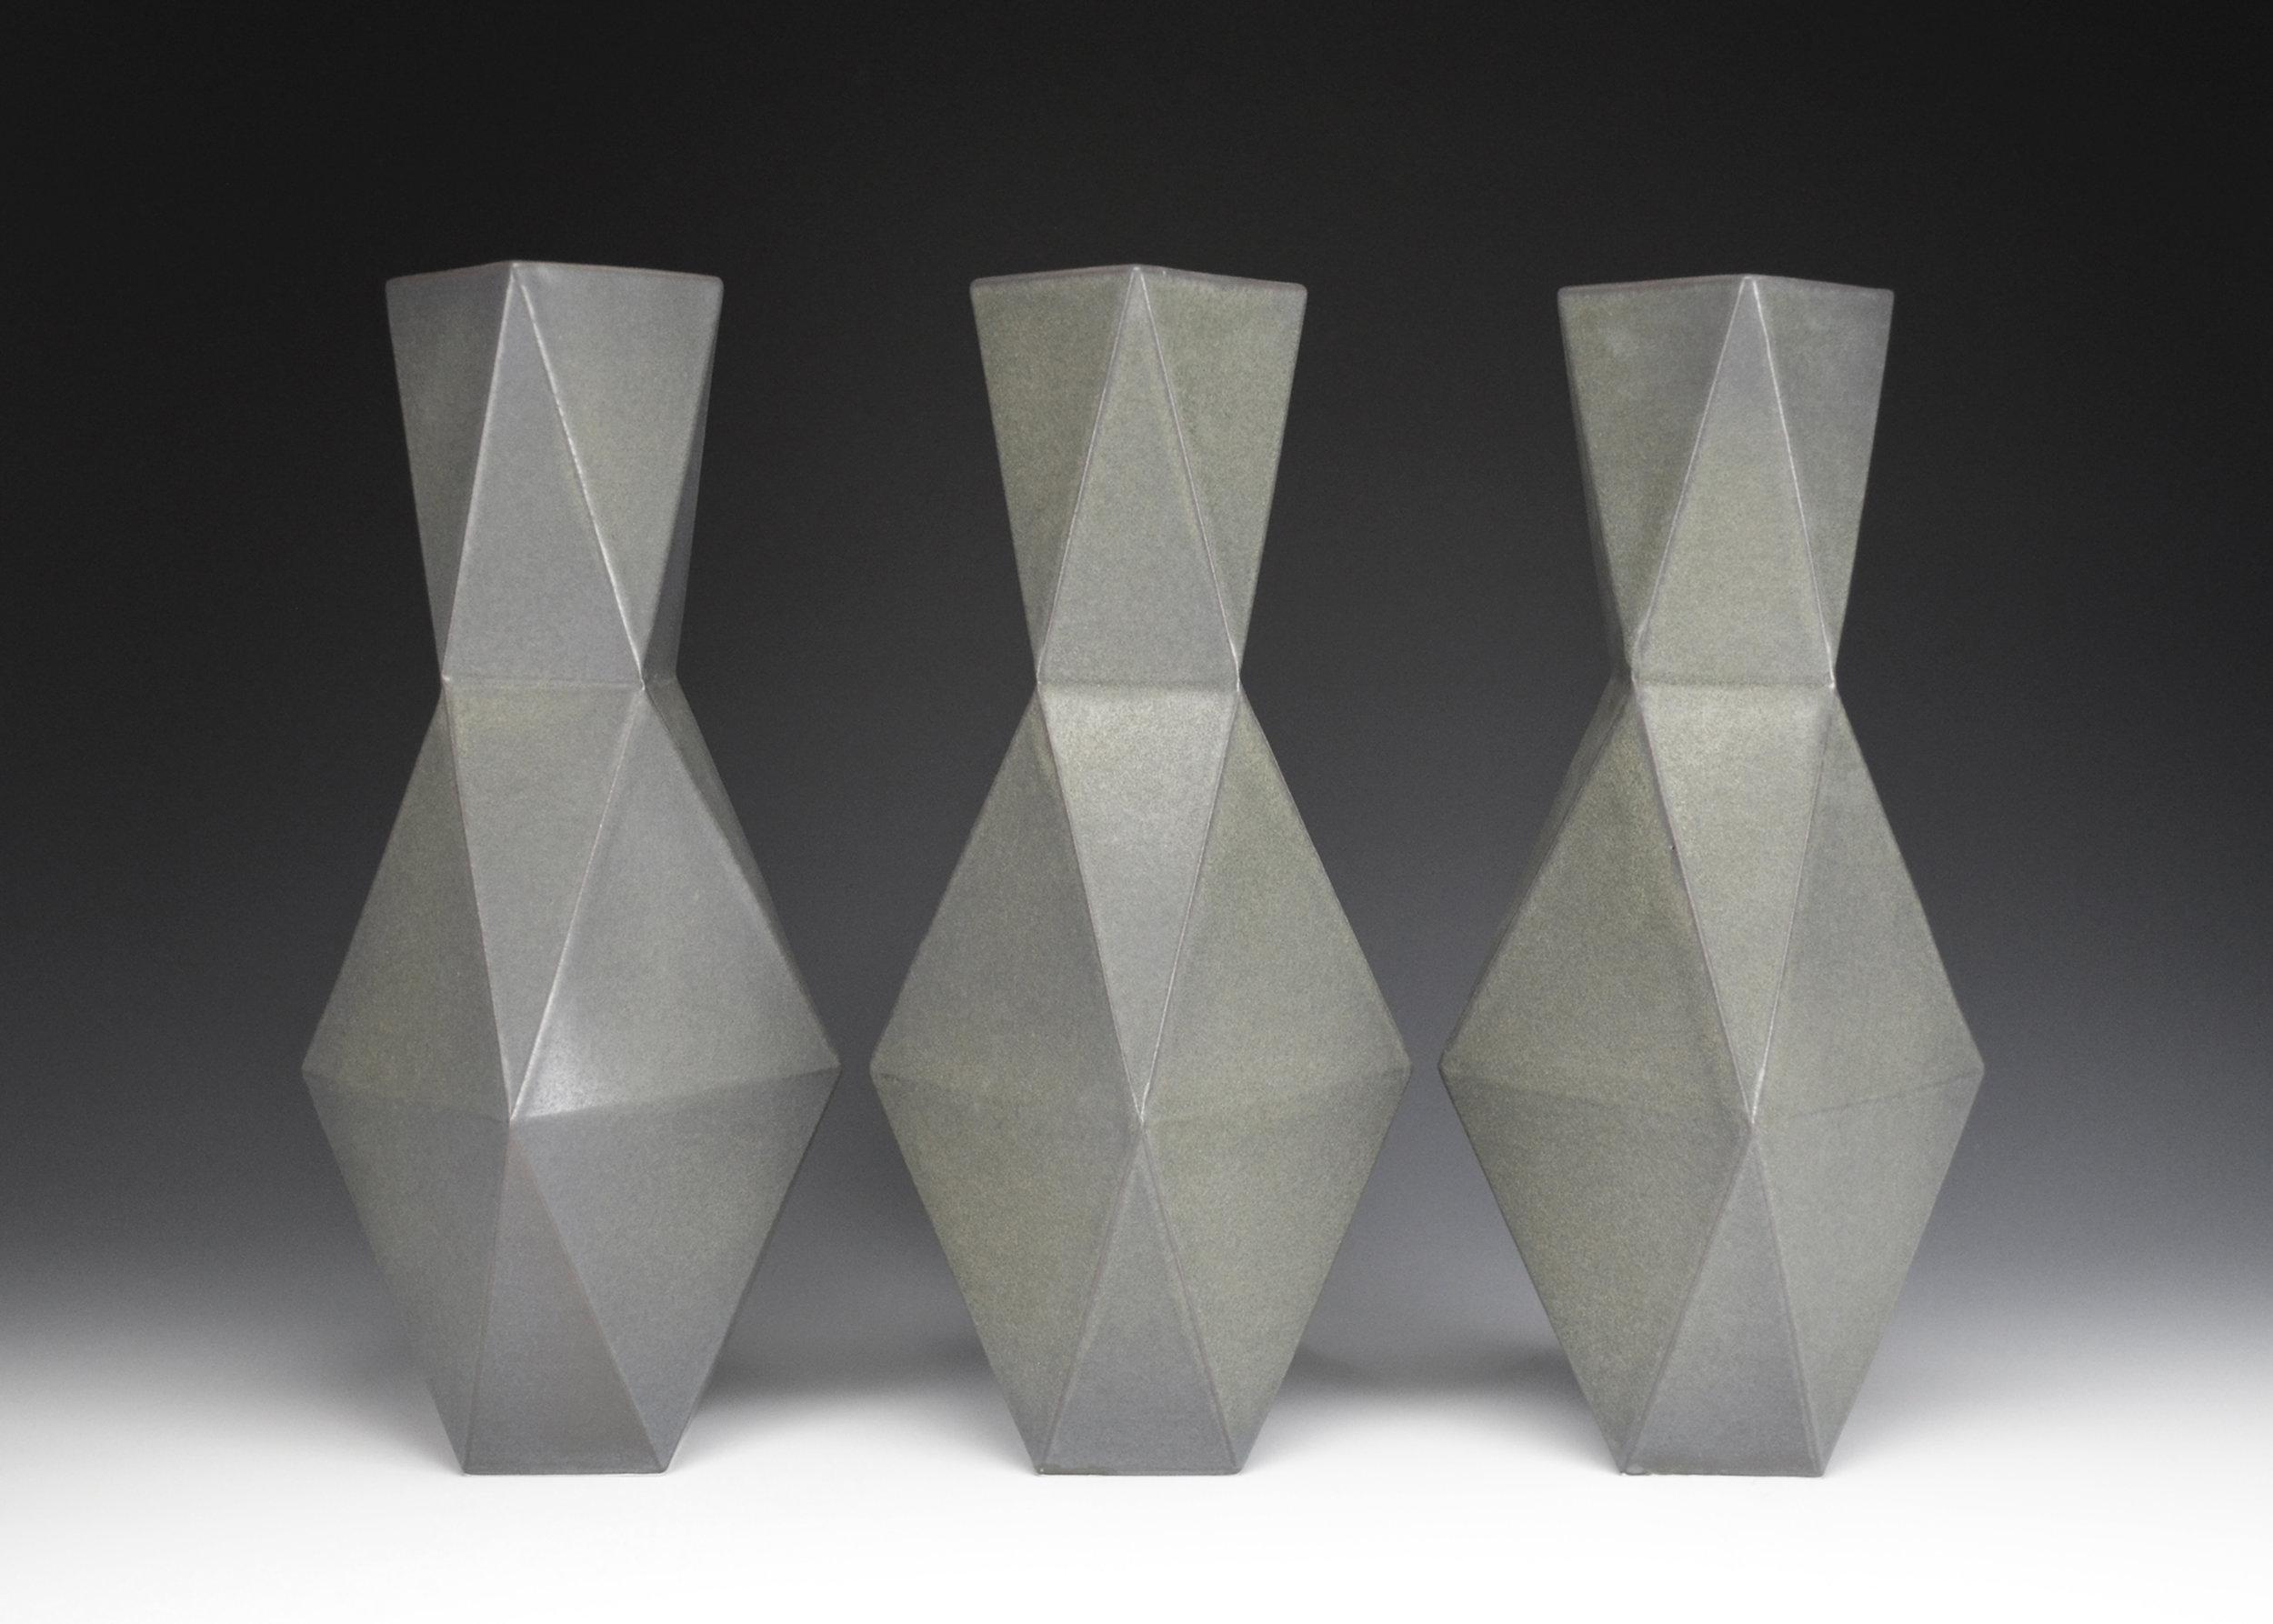 Vases (Black)  |  12.5 x 5 x 5 inches  |  Porcelain, Glaze  |  2017